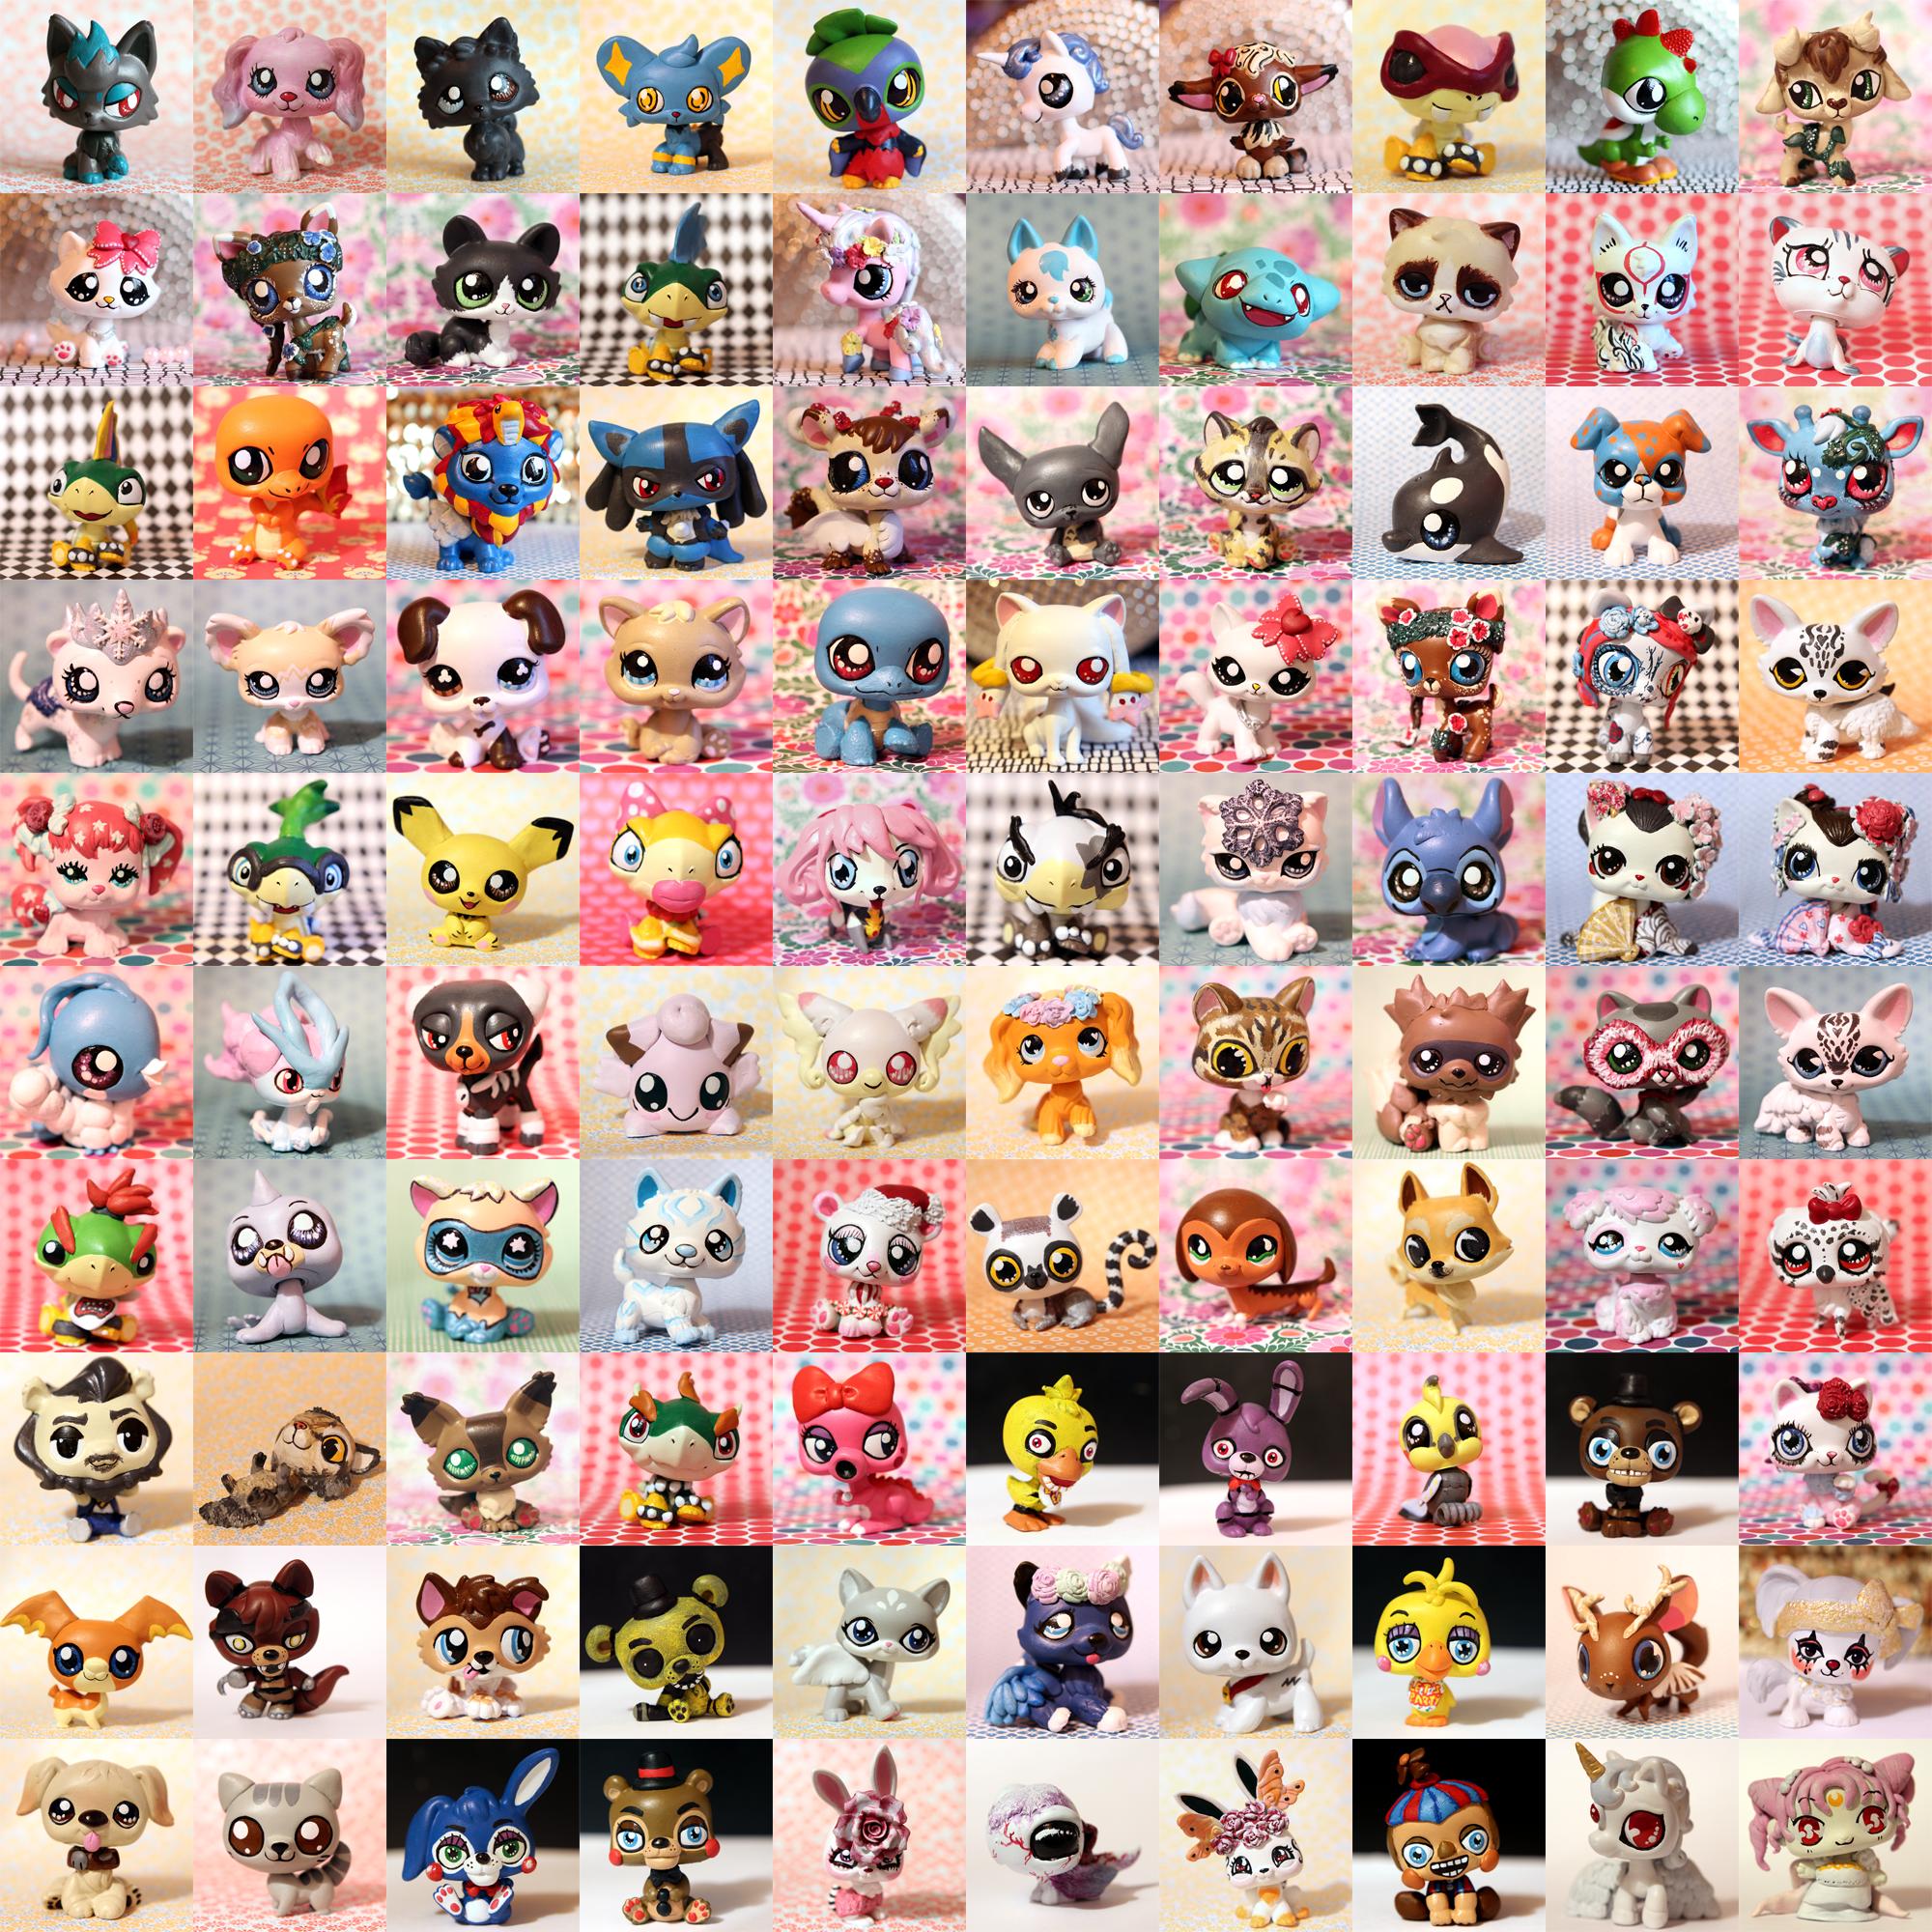 Customs 201 - 300! by pia-chu